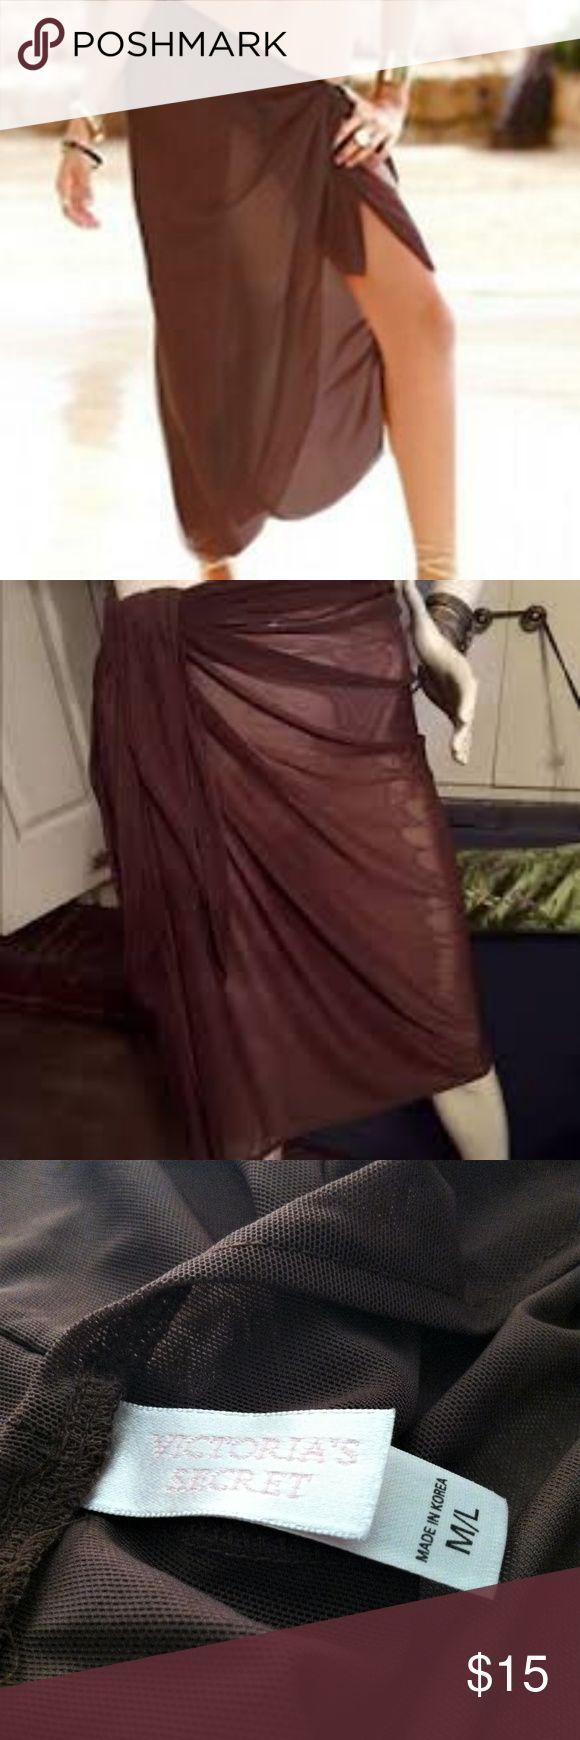 Victoria's Secret Sheer Brown Sarong wrap Pre-owned Victoria's Secret sh…